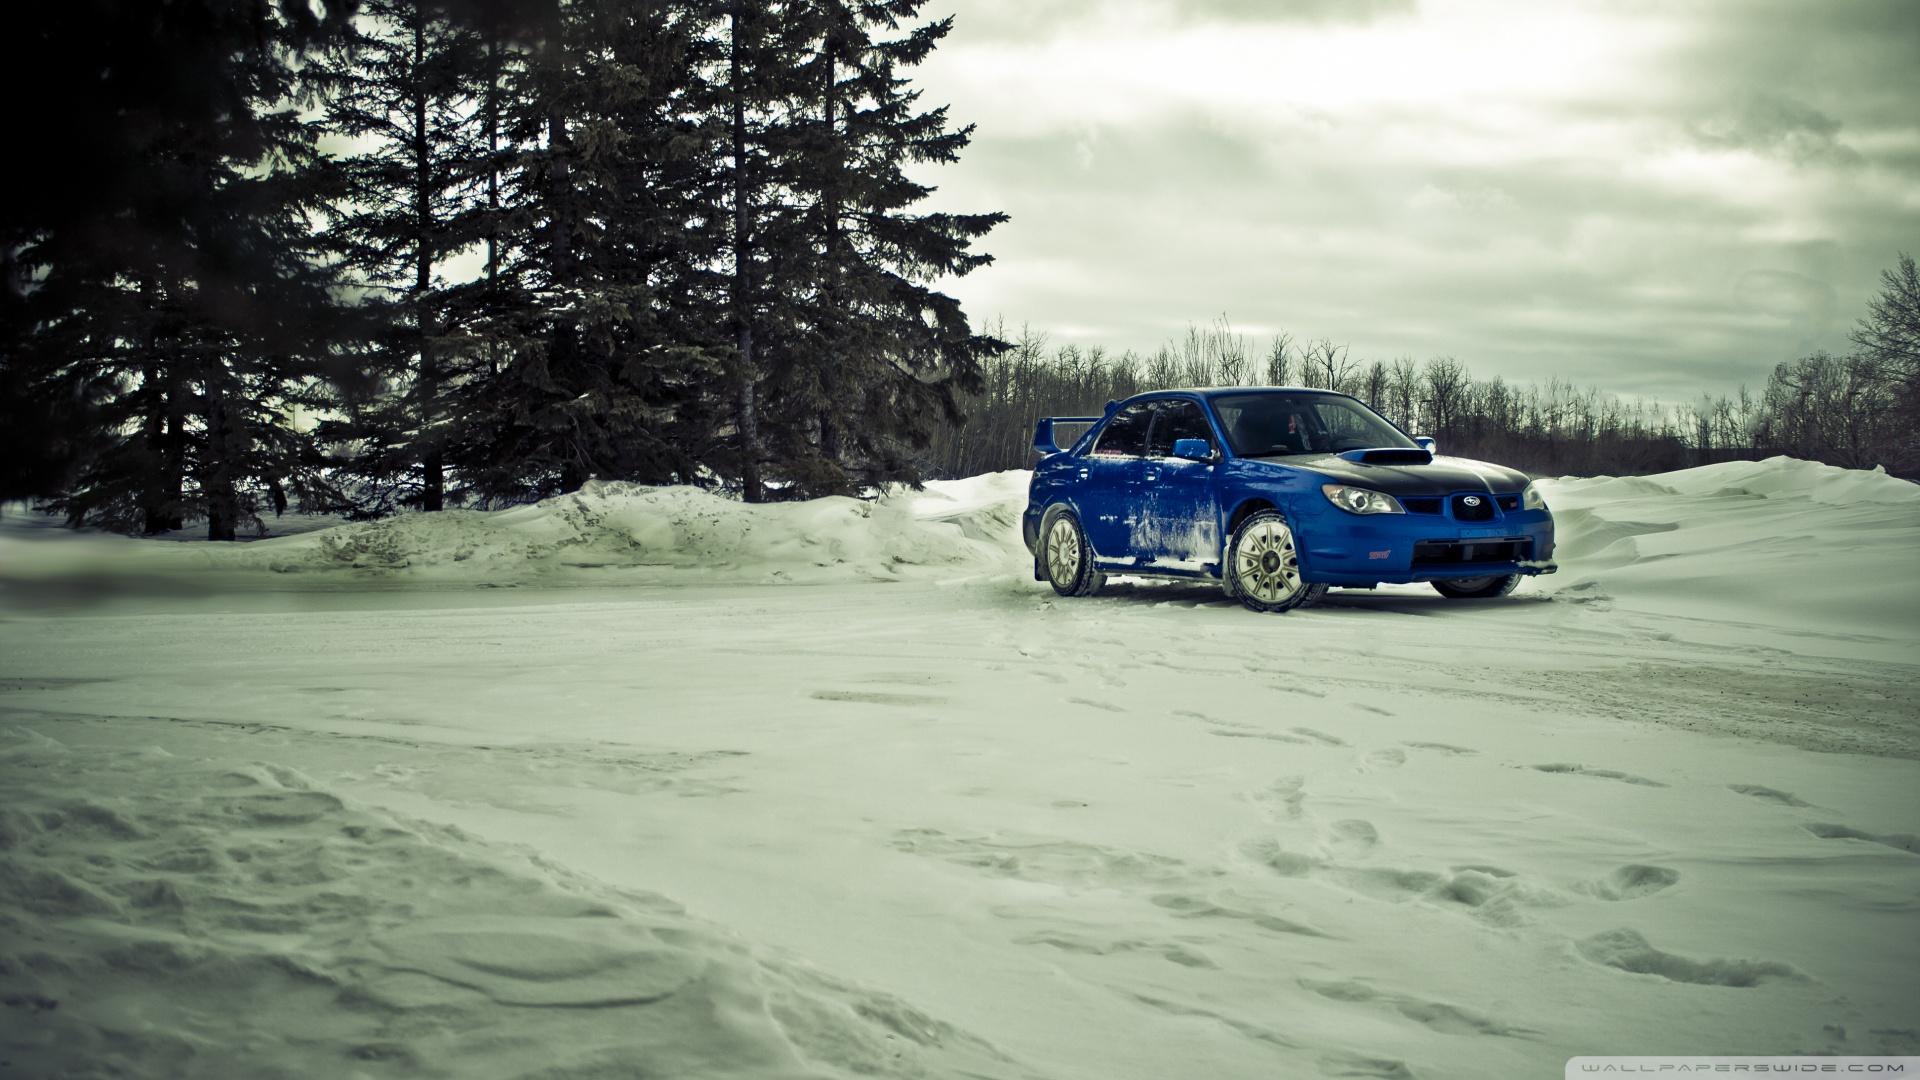 Subaru Impreza Wrx Sti Rally Car Wallpaper Subaru Sti Winter 4k Hd Desktop Wallpaper For Dual